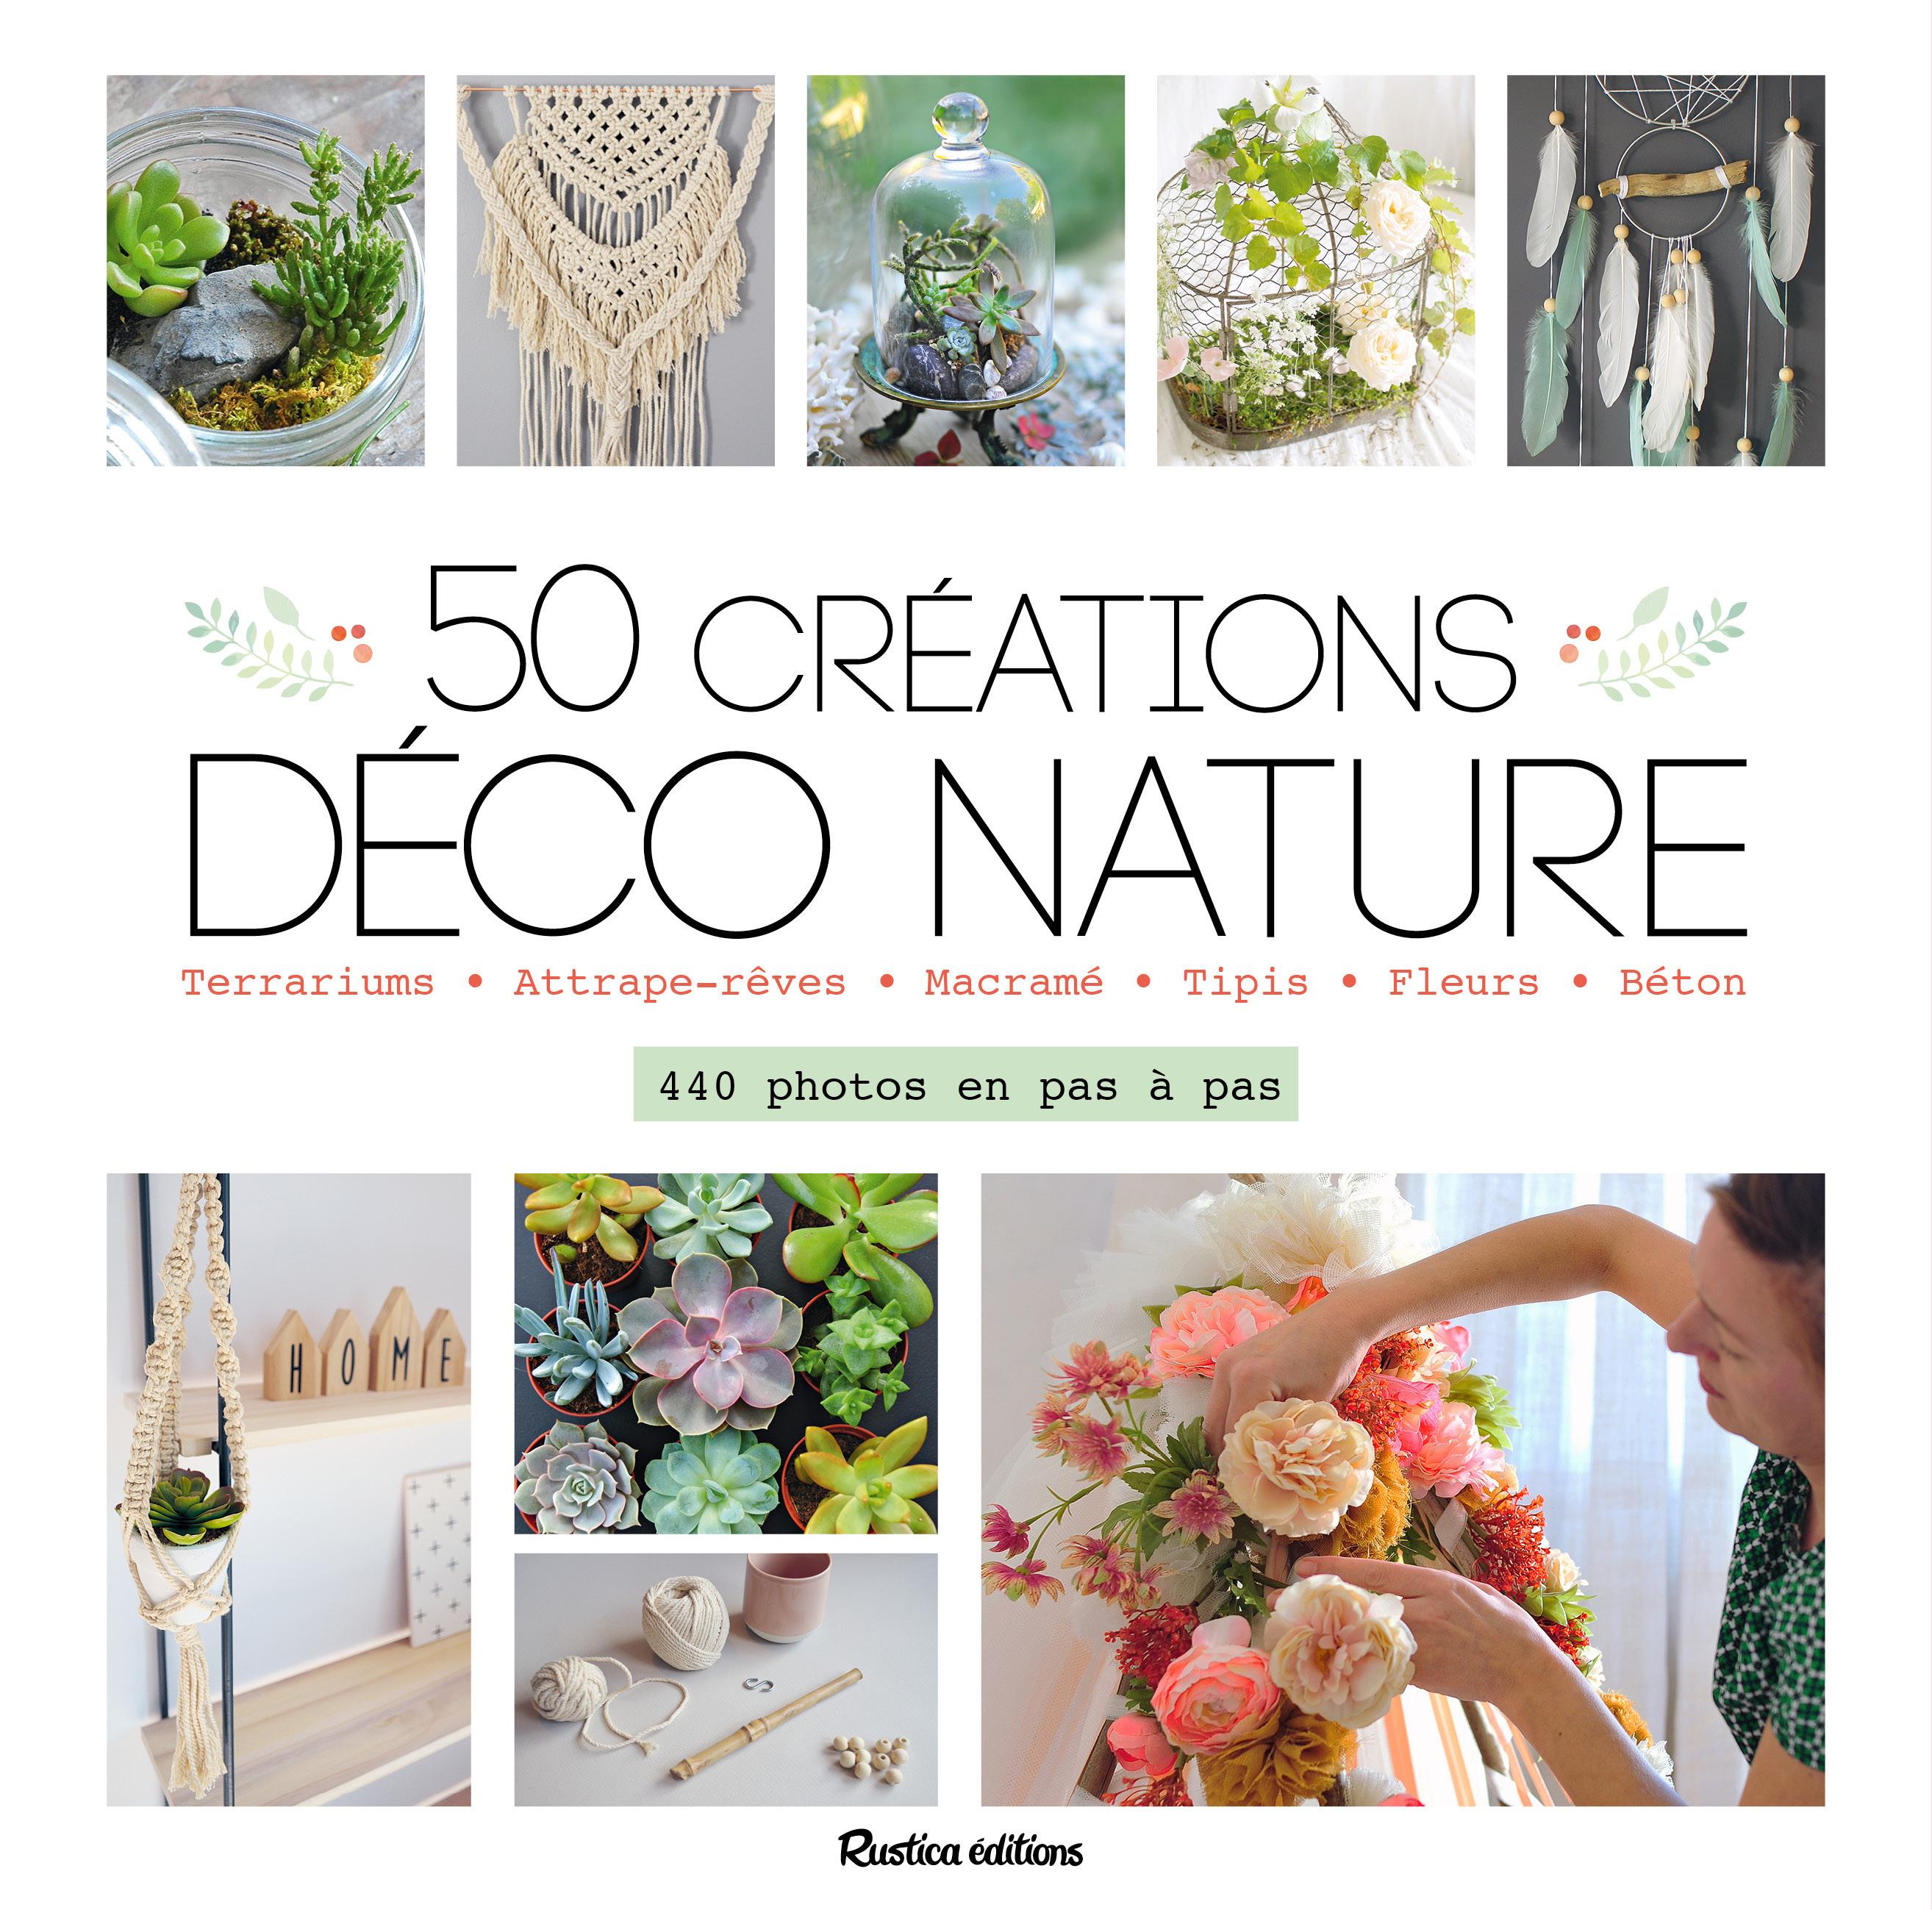 50 CREATIONS DECO NATURE